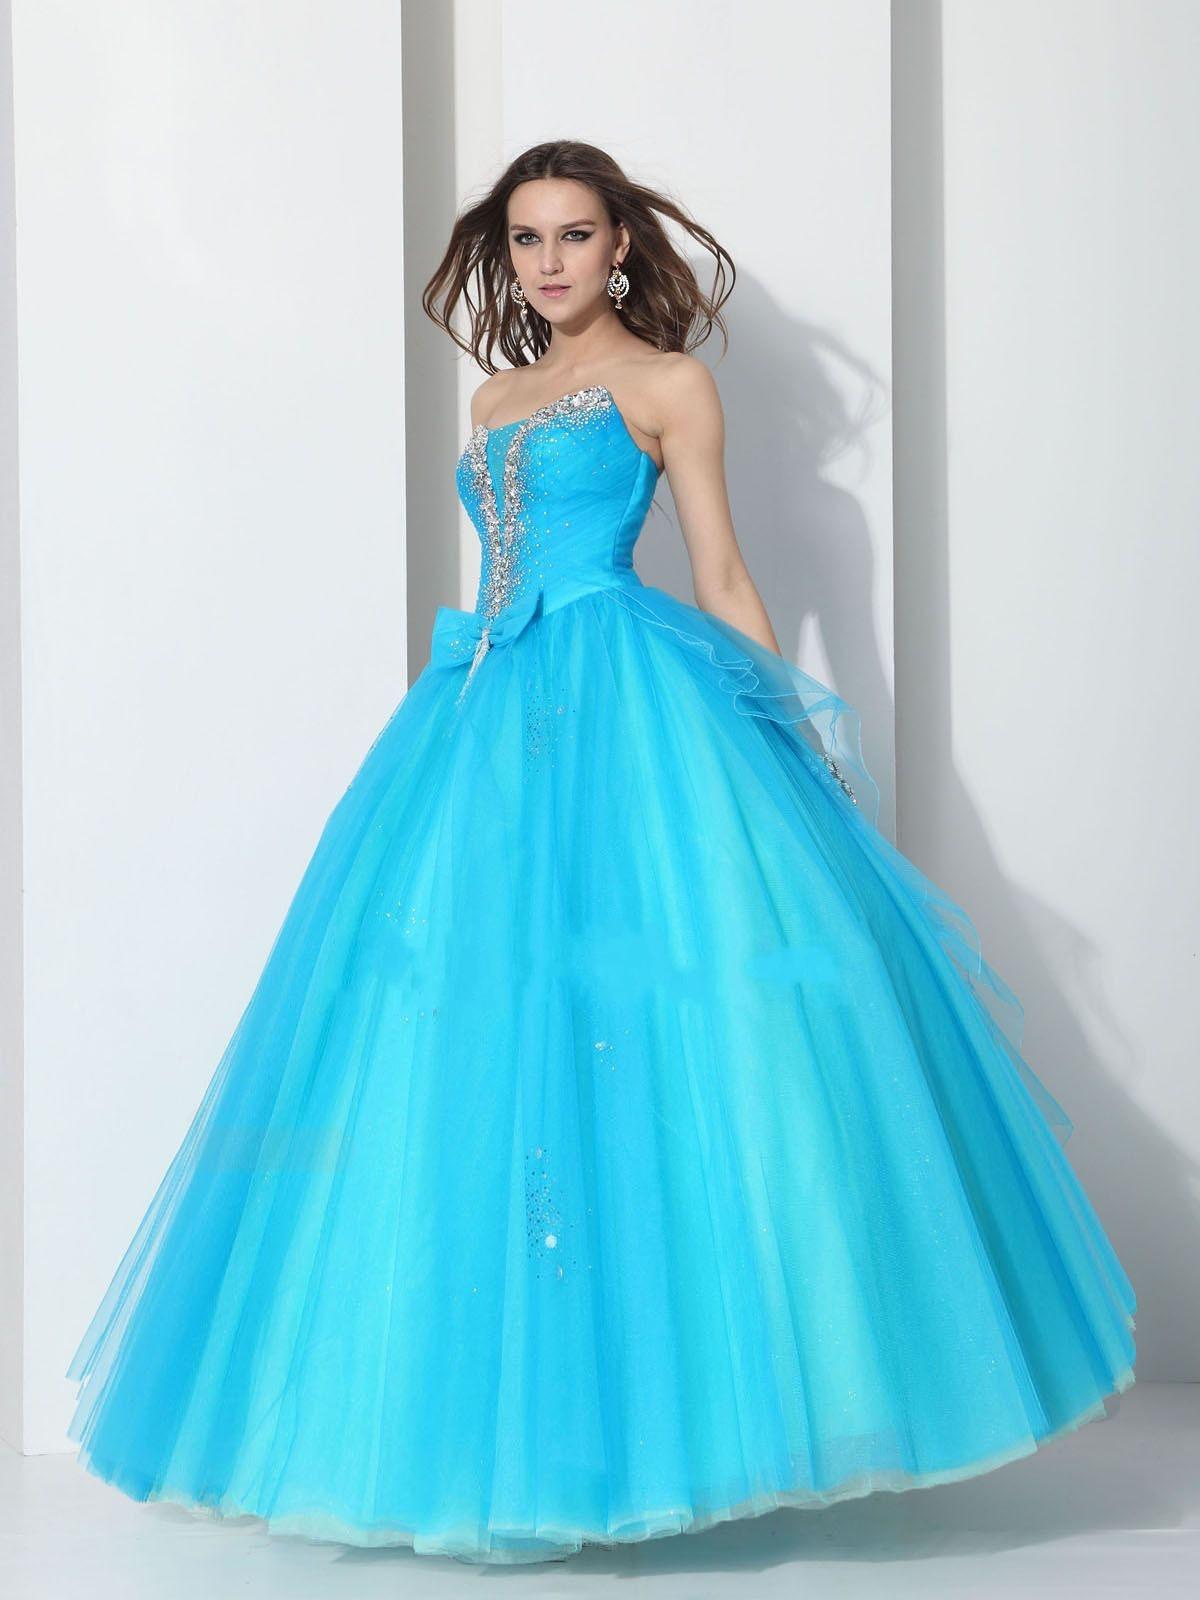 smile!: prom dresses